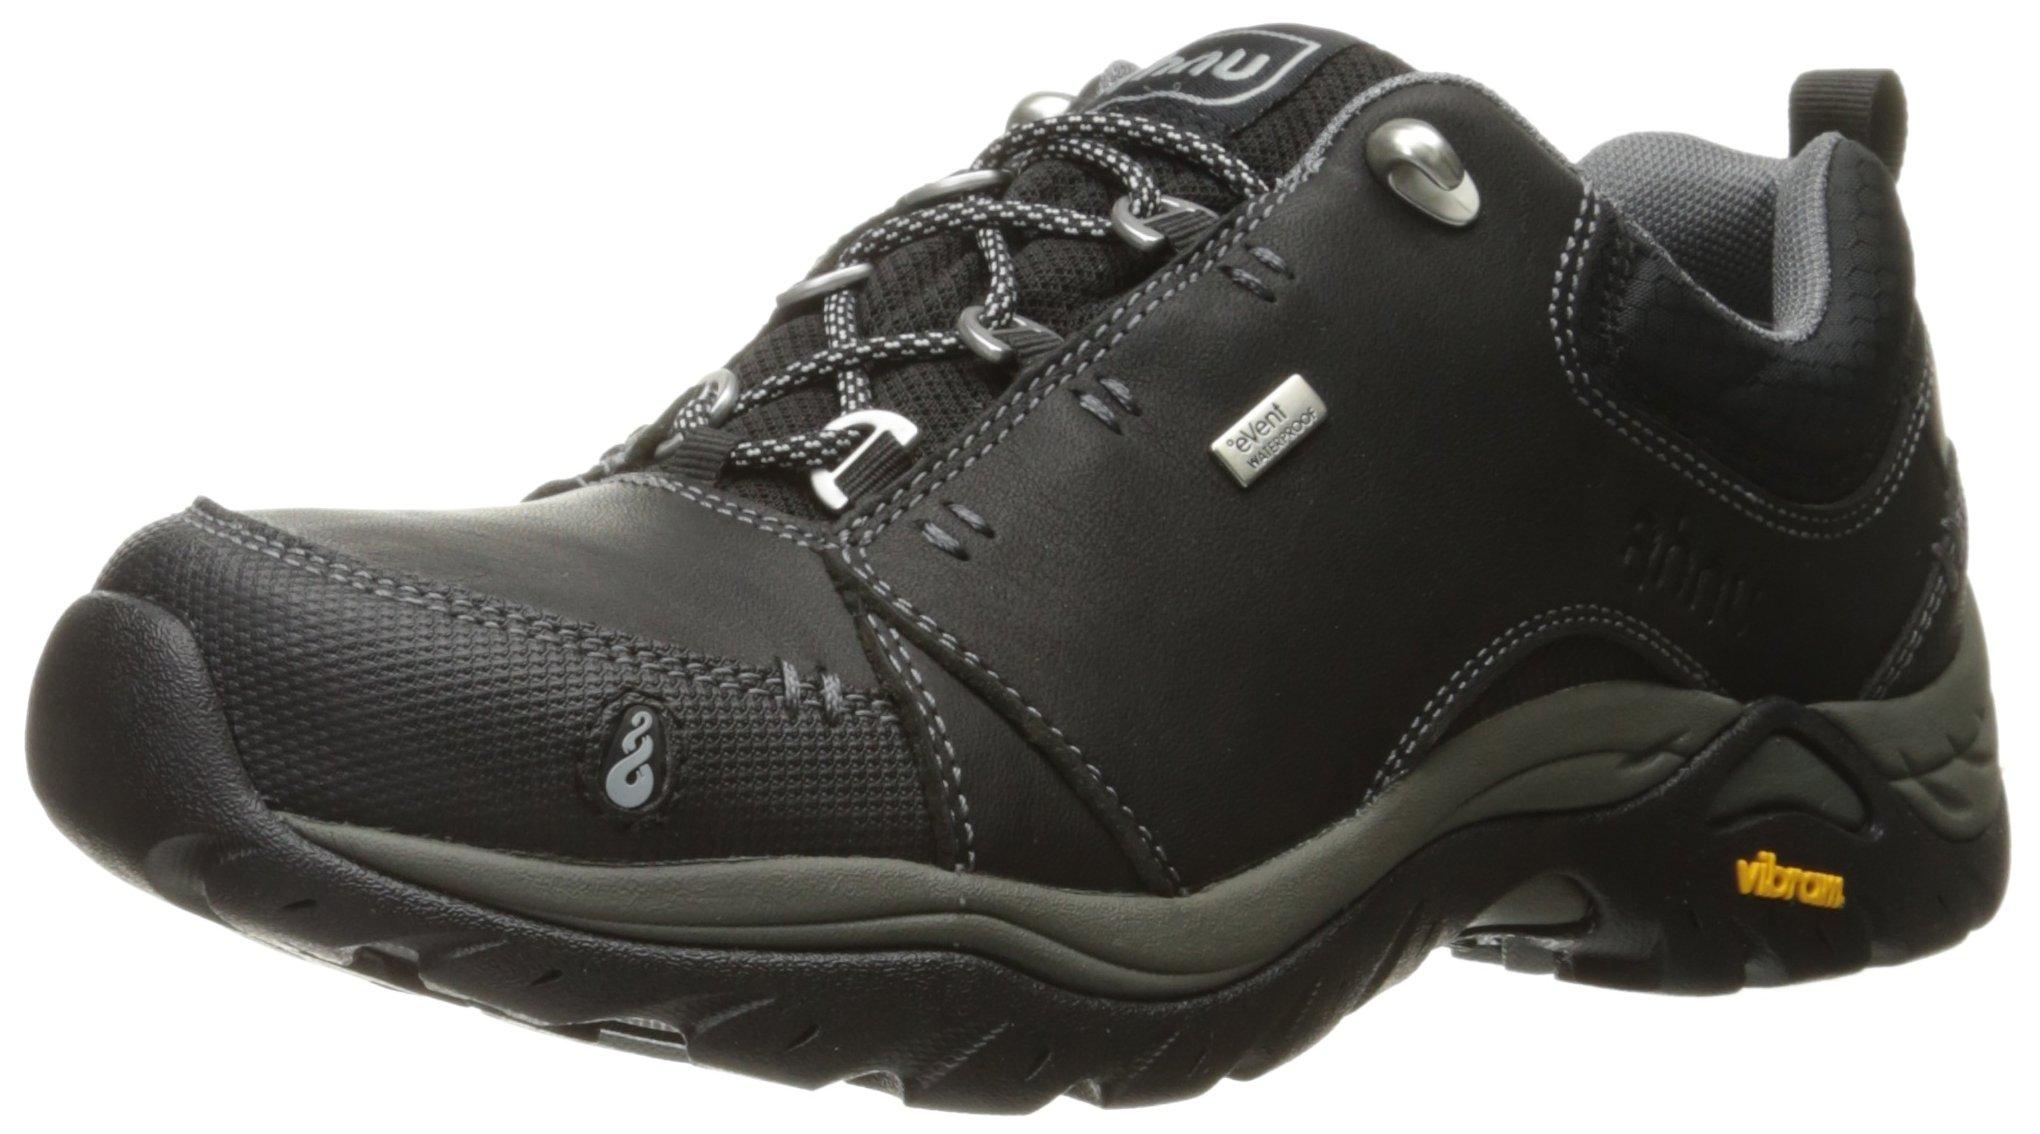 Ahnu Women's Montara II Waterproof Hiking Shoe, New Black, 8 M US